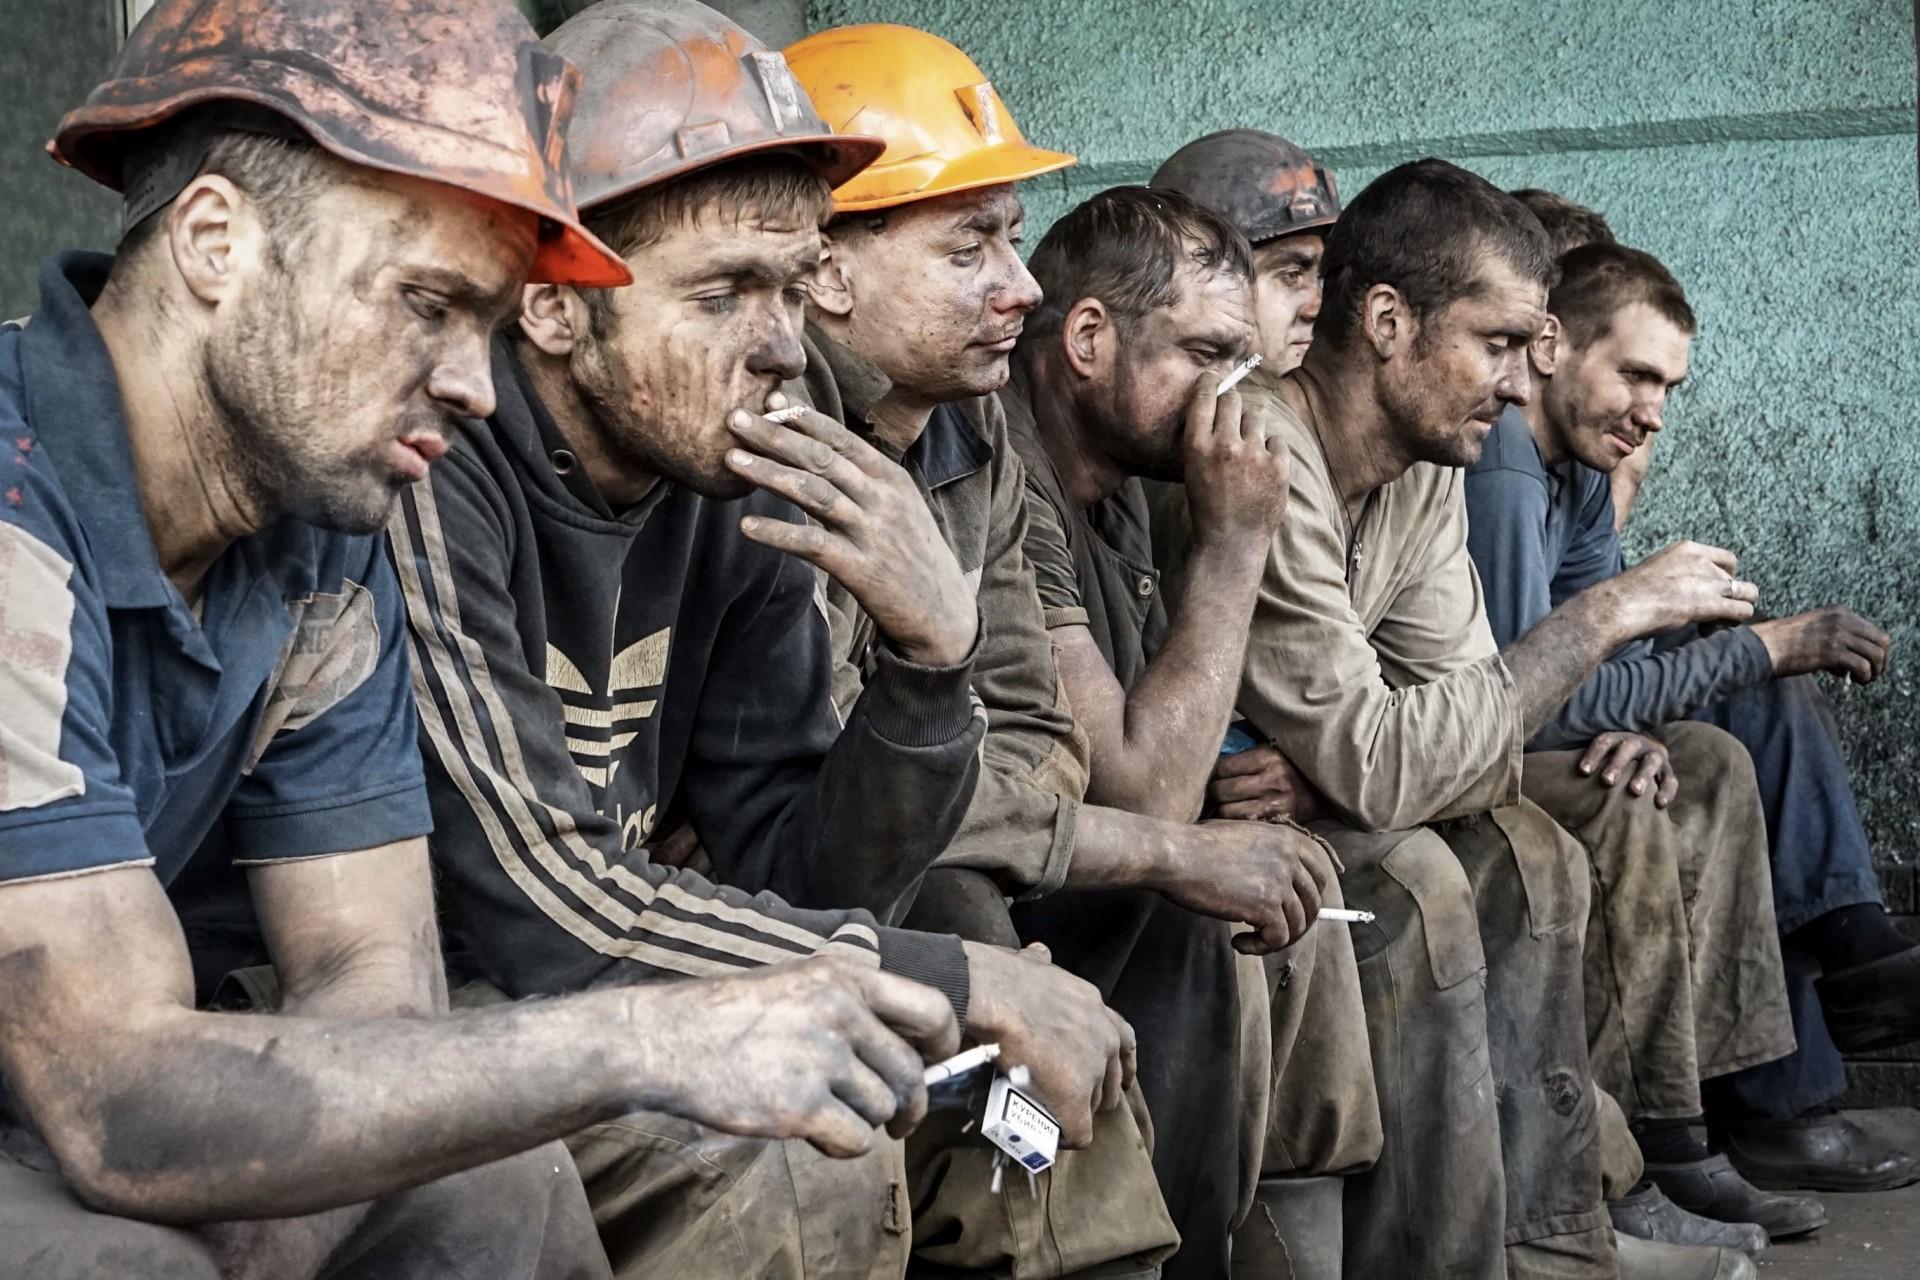 картинки шахтерские приколы эти три цвета